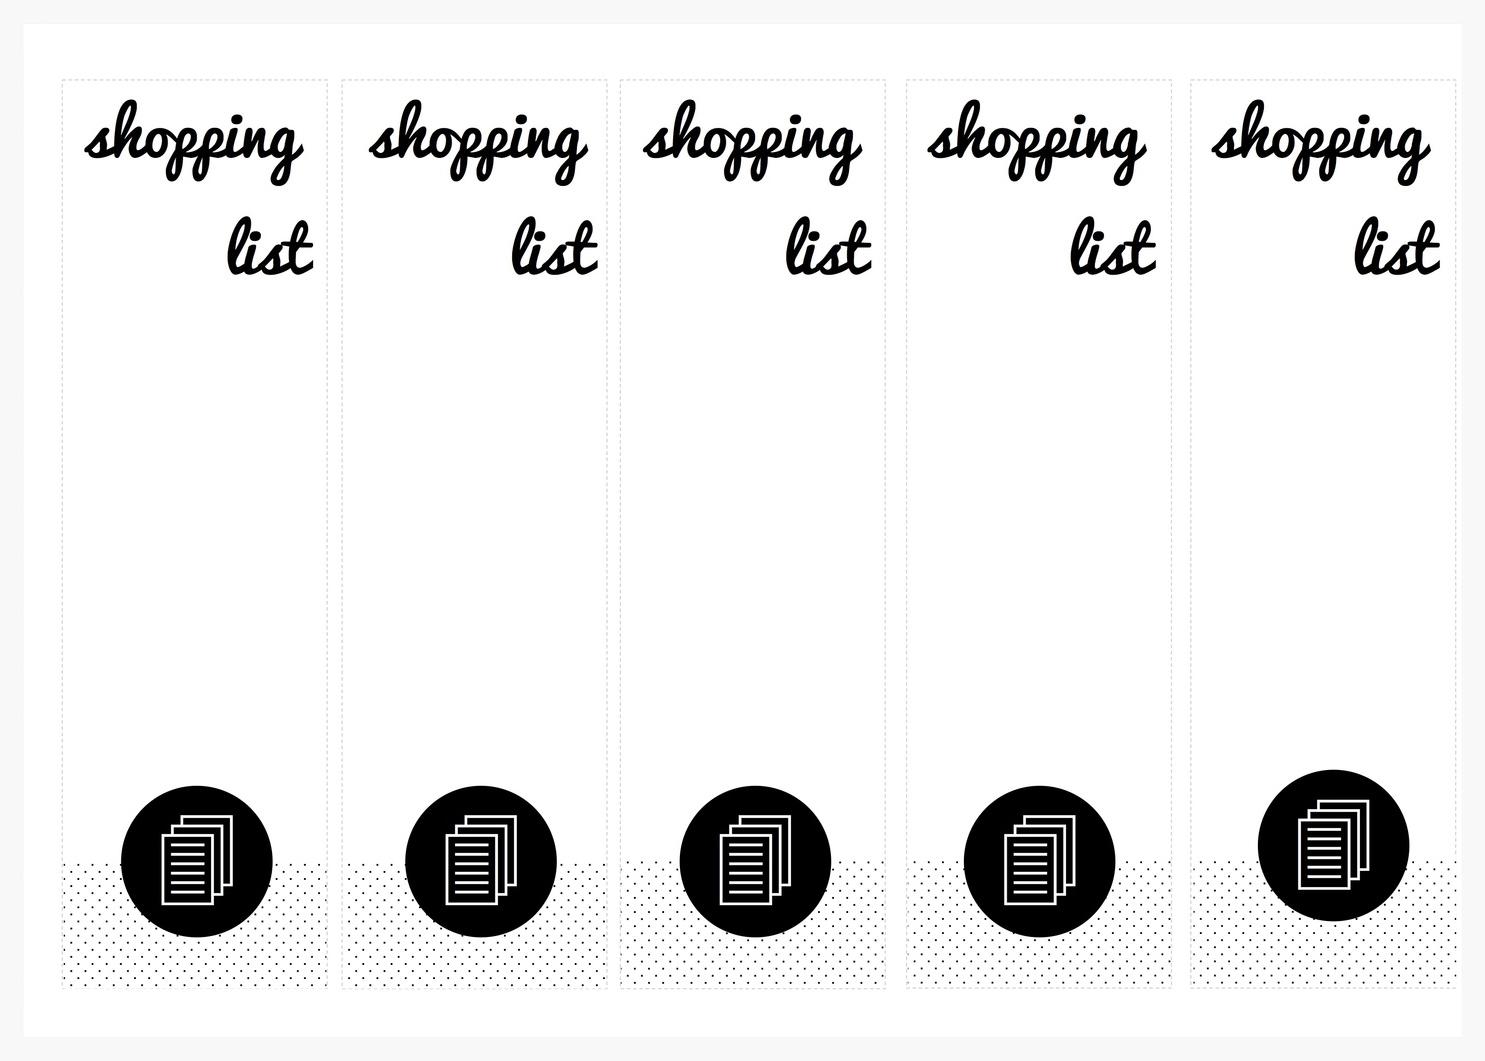 2014-11 - shopping lis.jpg